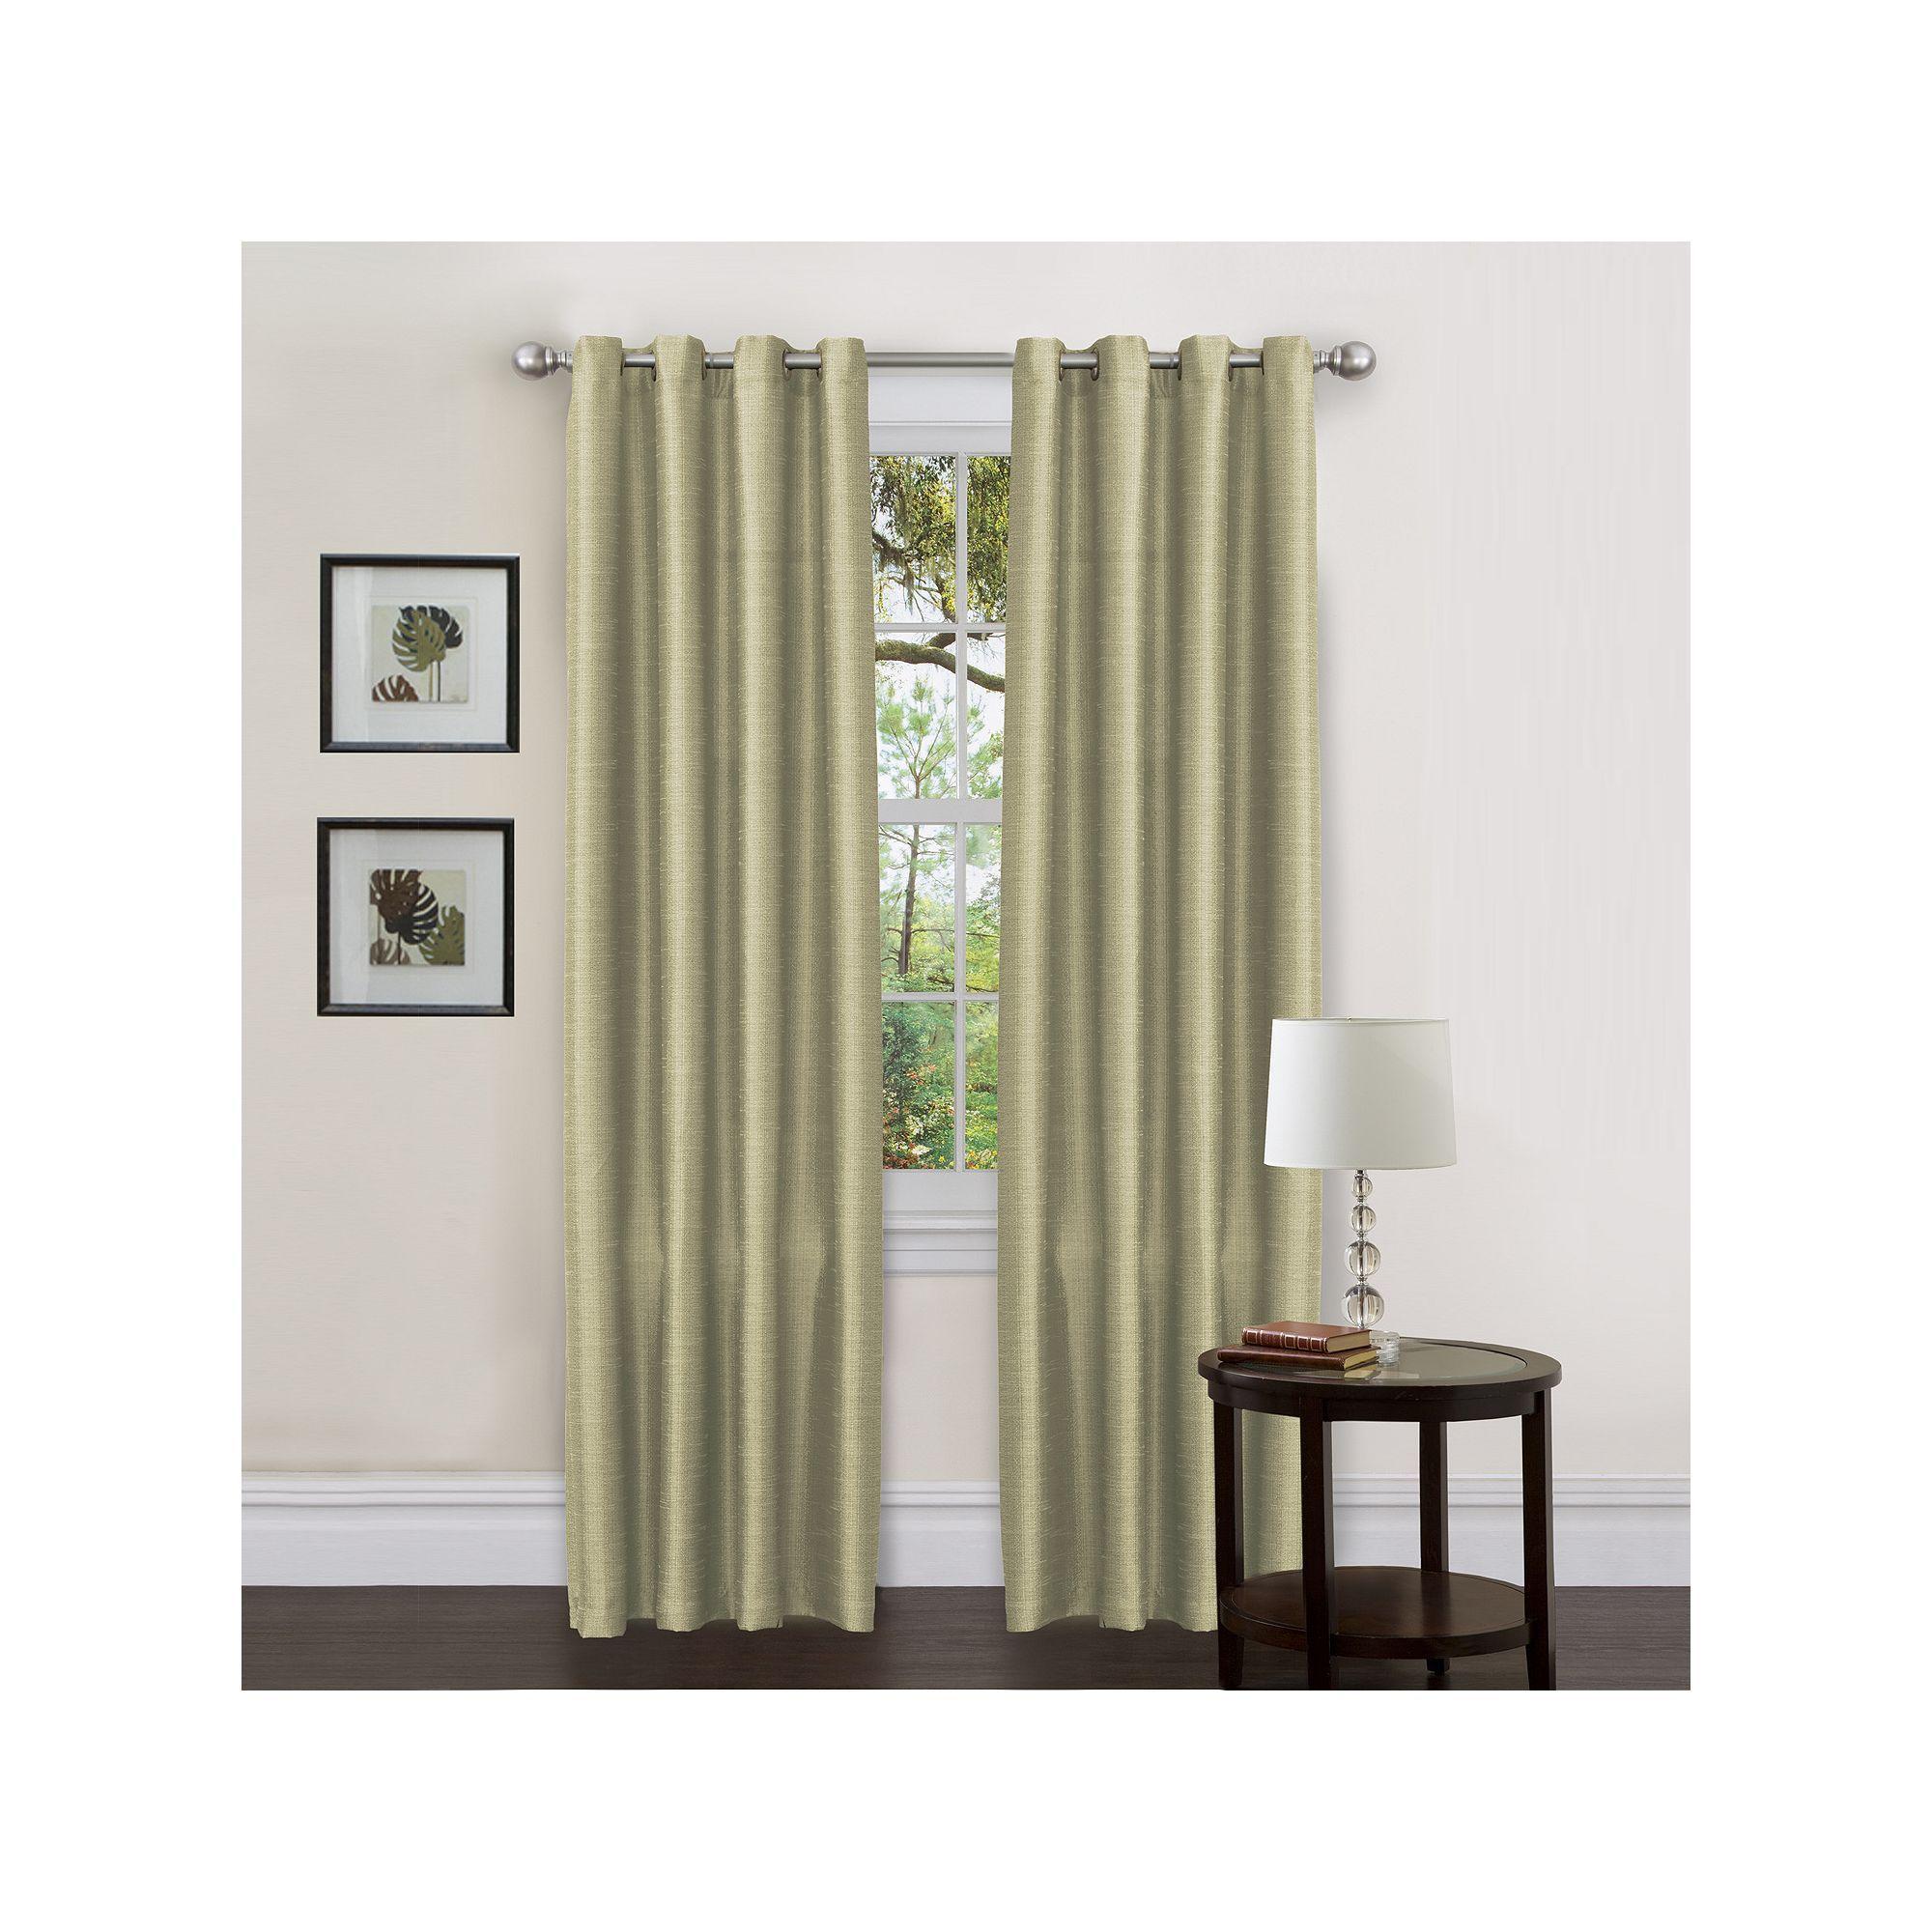 Lush Decor 1 Panel Felicity Window Panel Drapes Curtains Decor Green Curtains